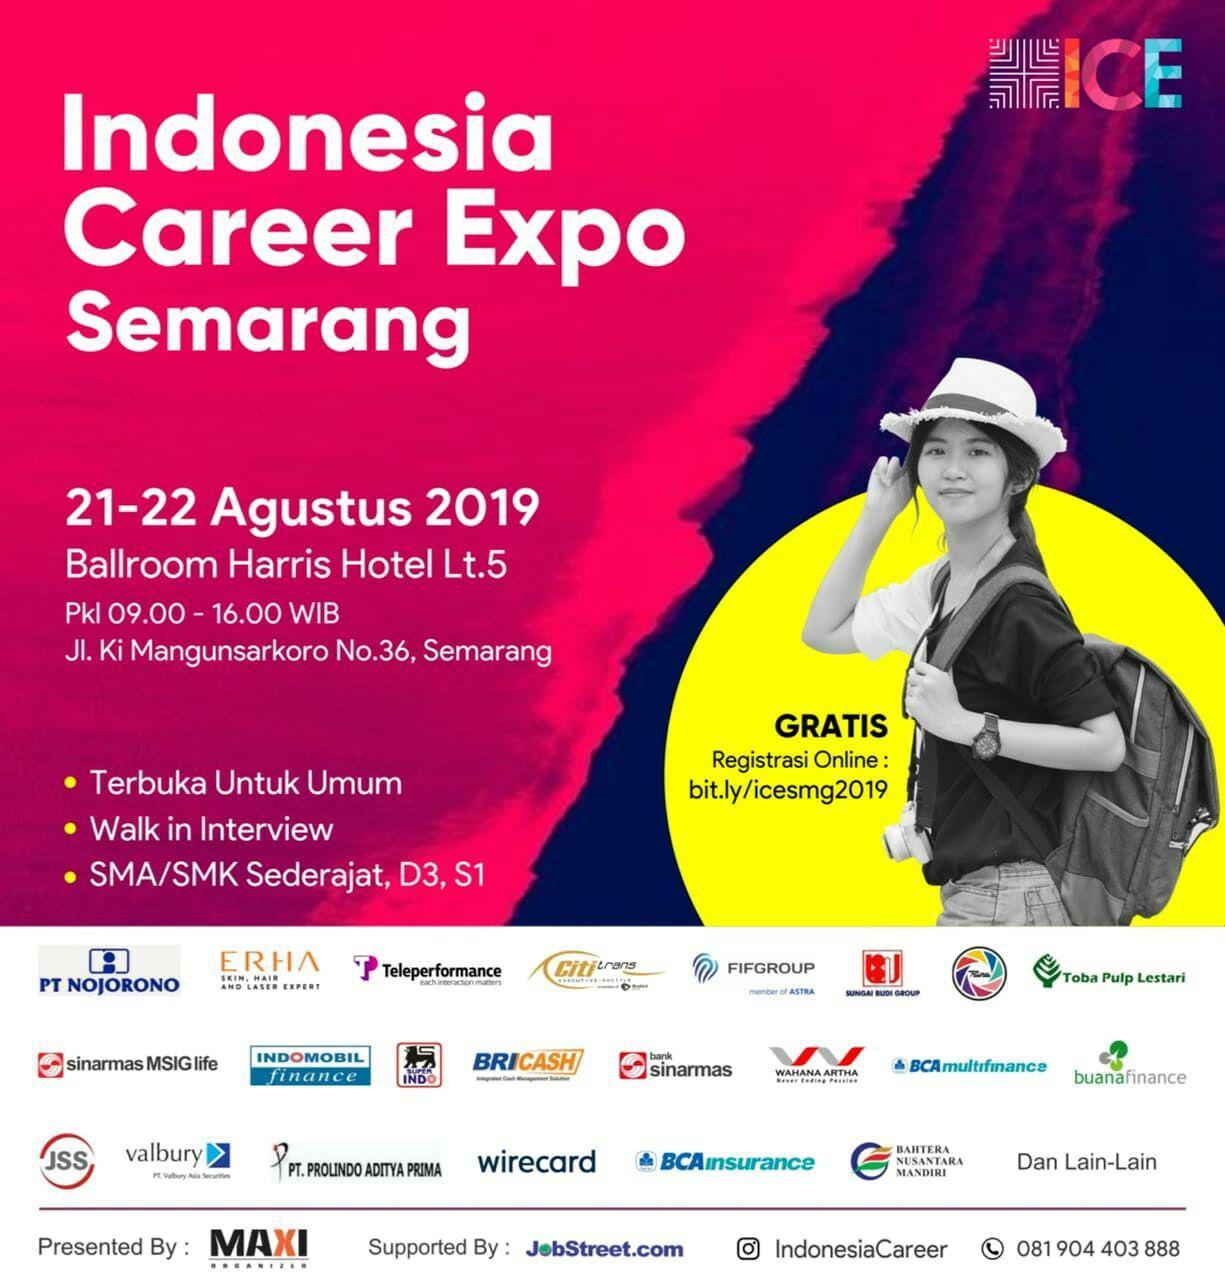 JOB FAIR INDONESIA CAREER EXPO SEMARANG 21-22 AGUSTUS 2019